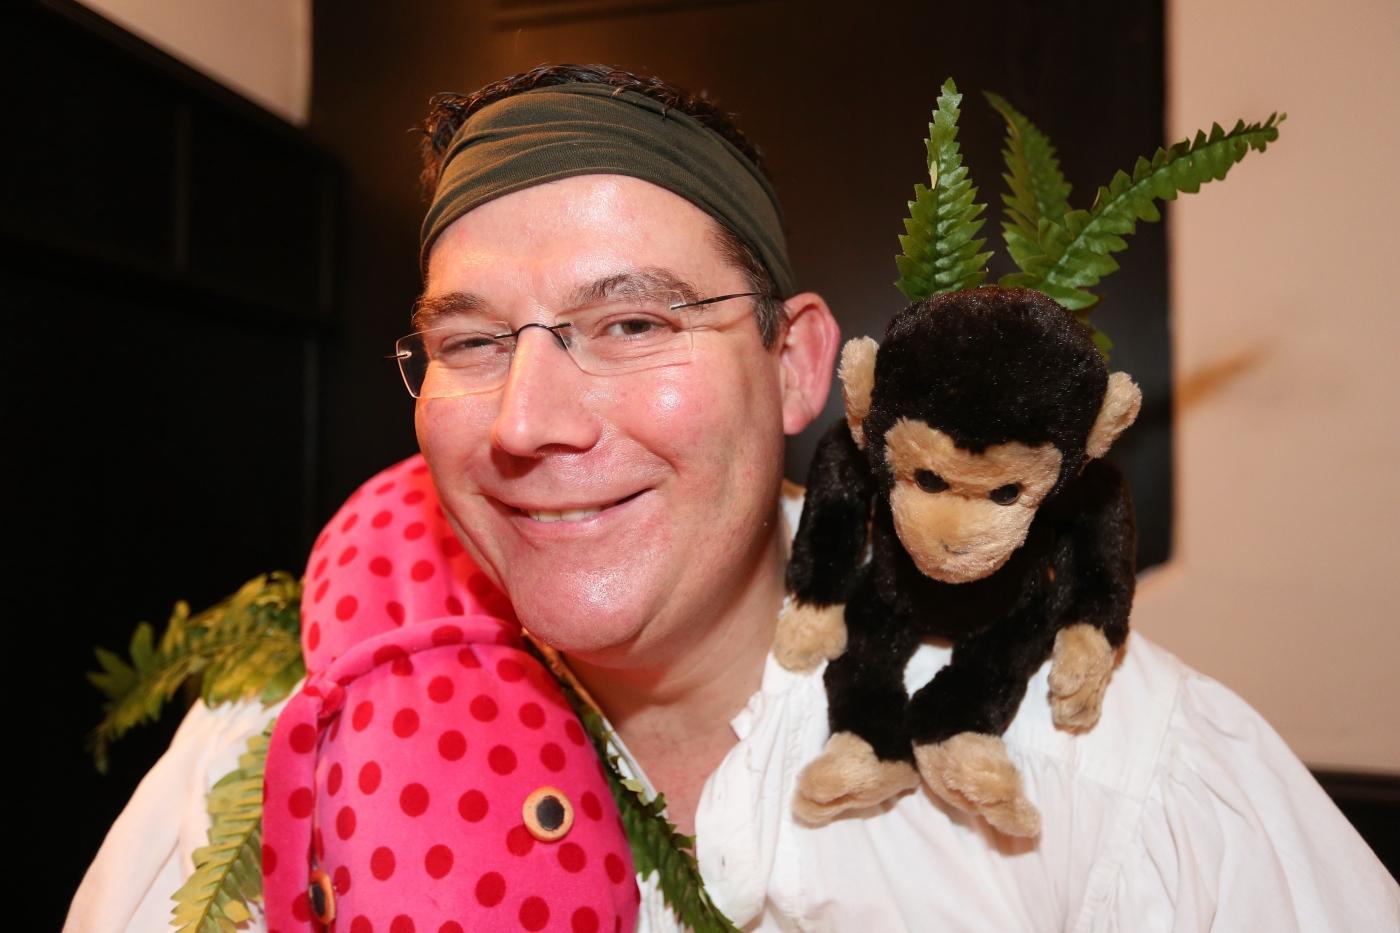 ISP Wolfgang Grube